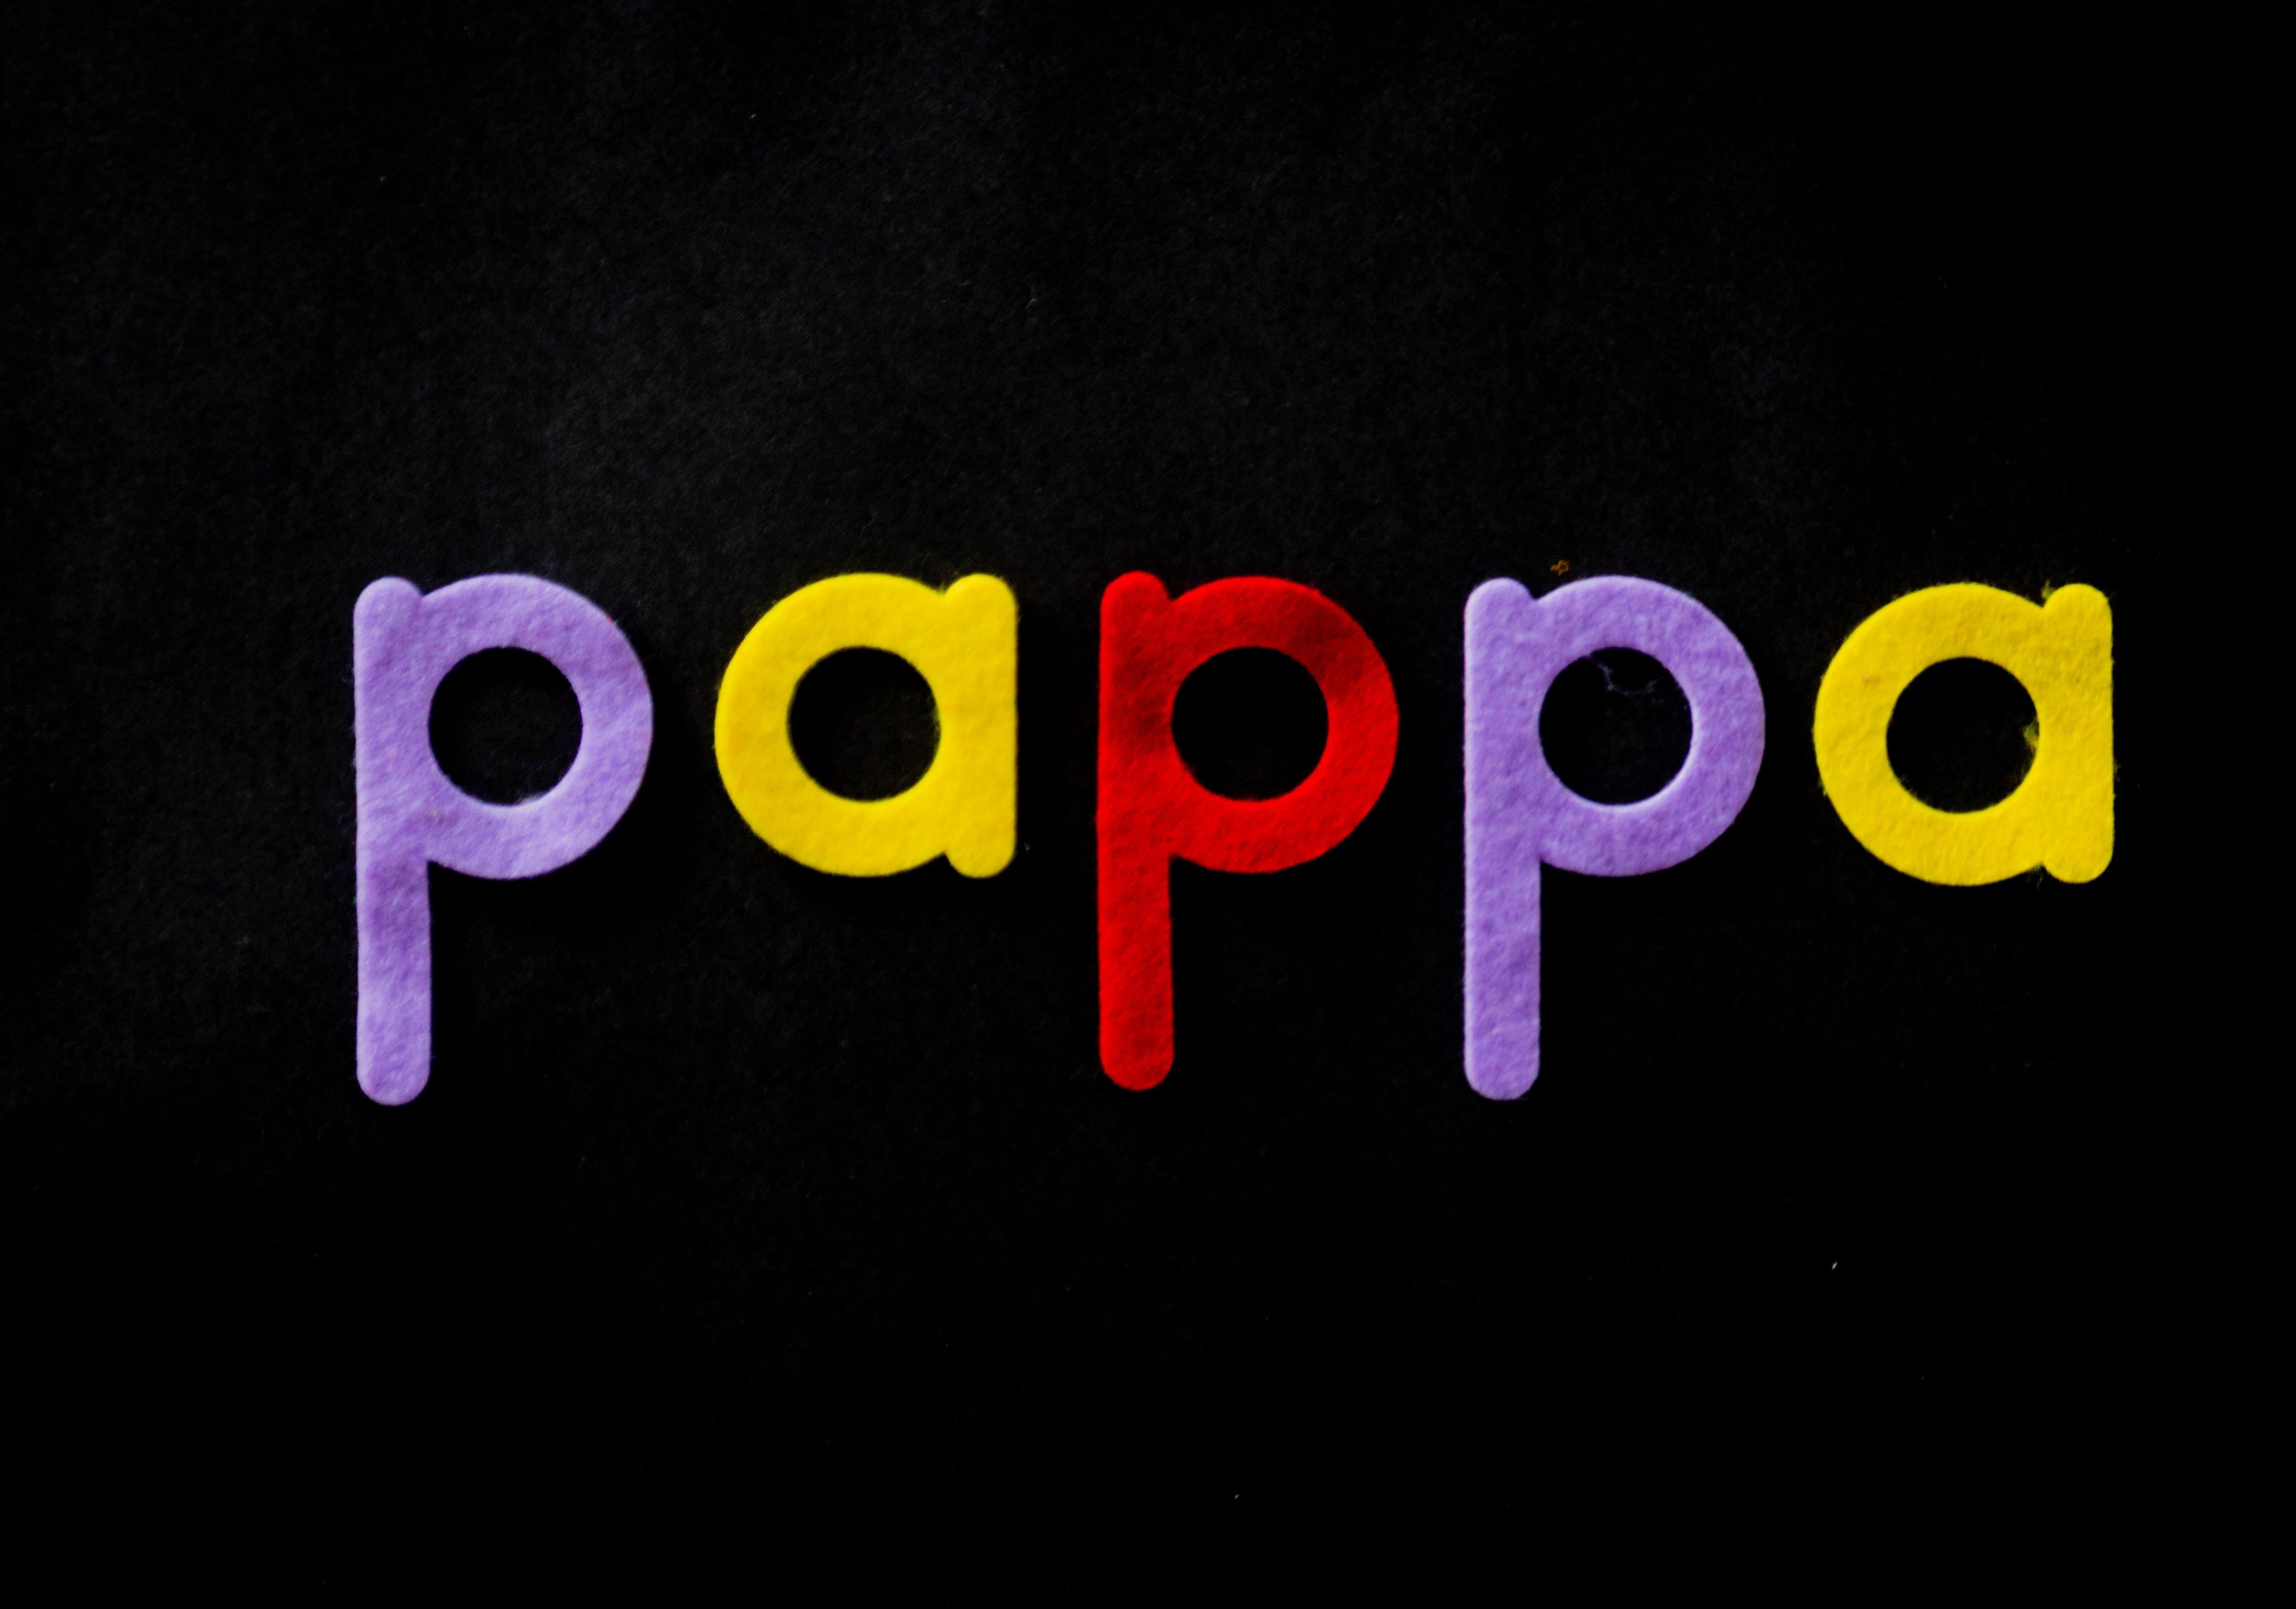 Gratis arkivbilde med alfabeter, farger, fargerik, flerfarget